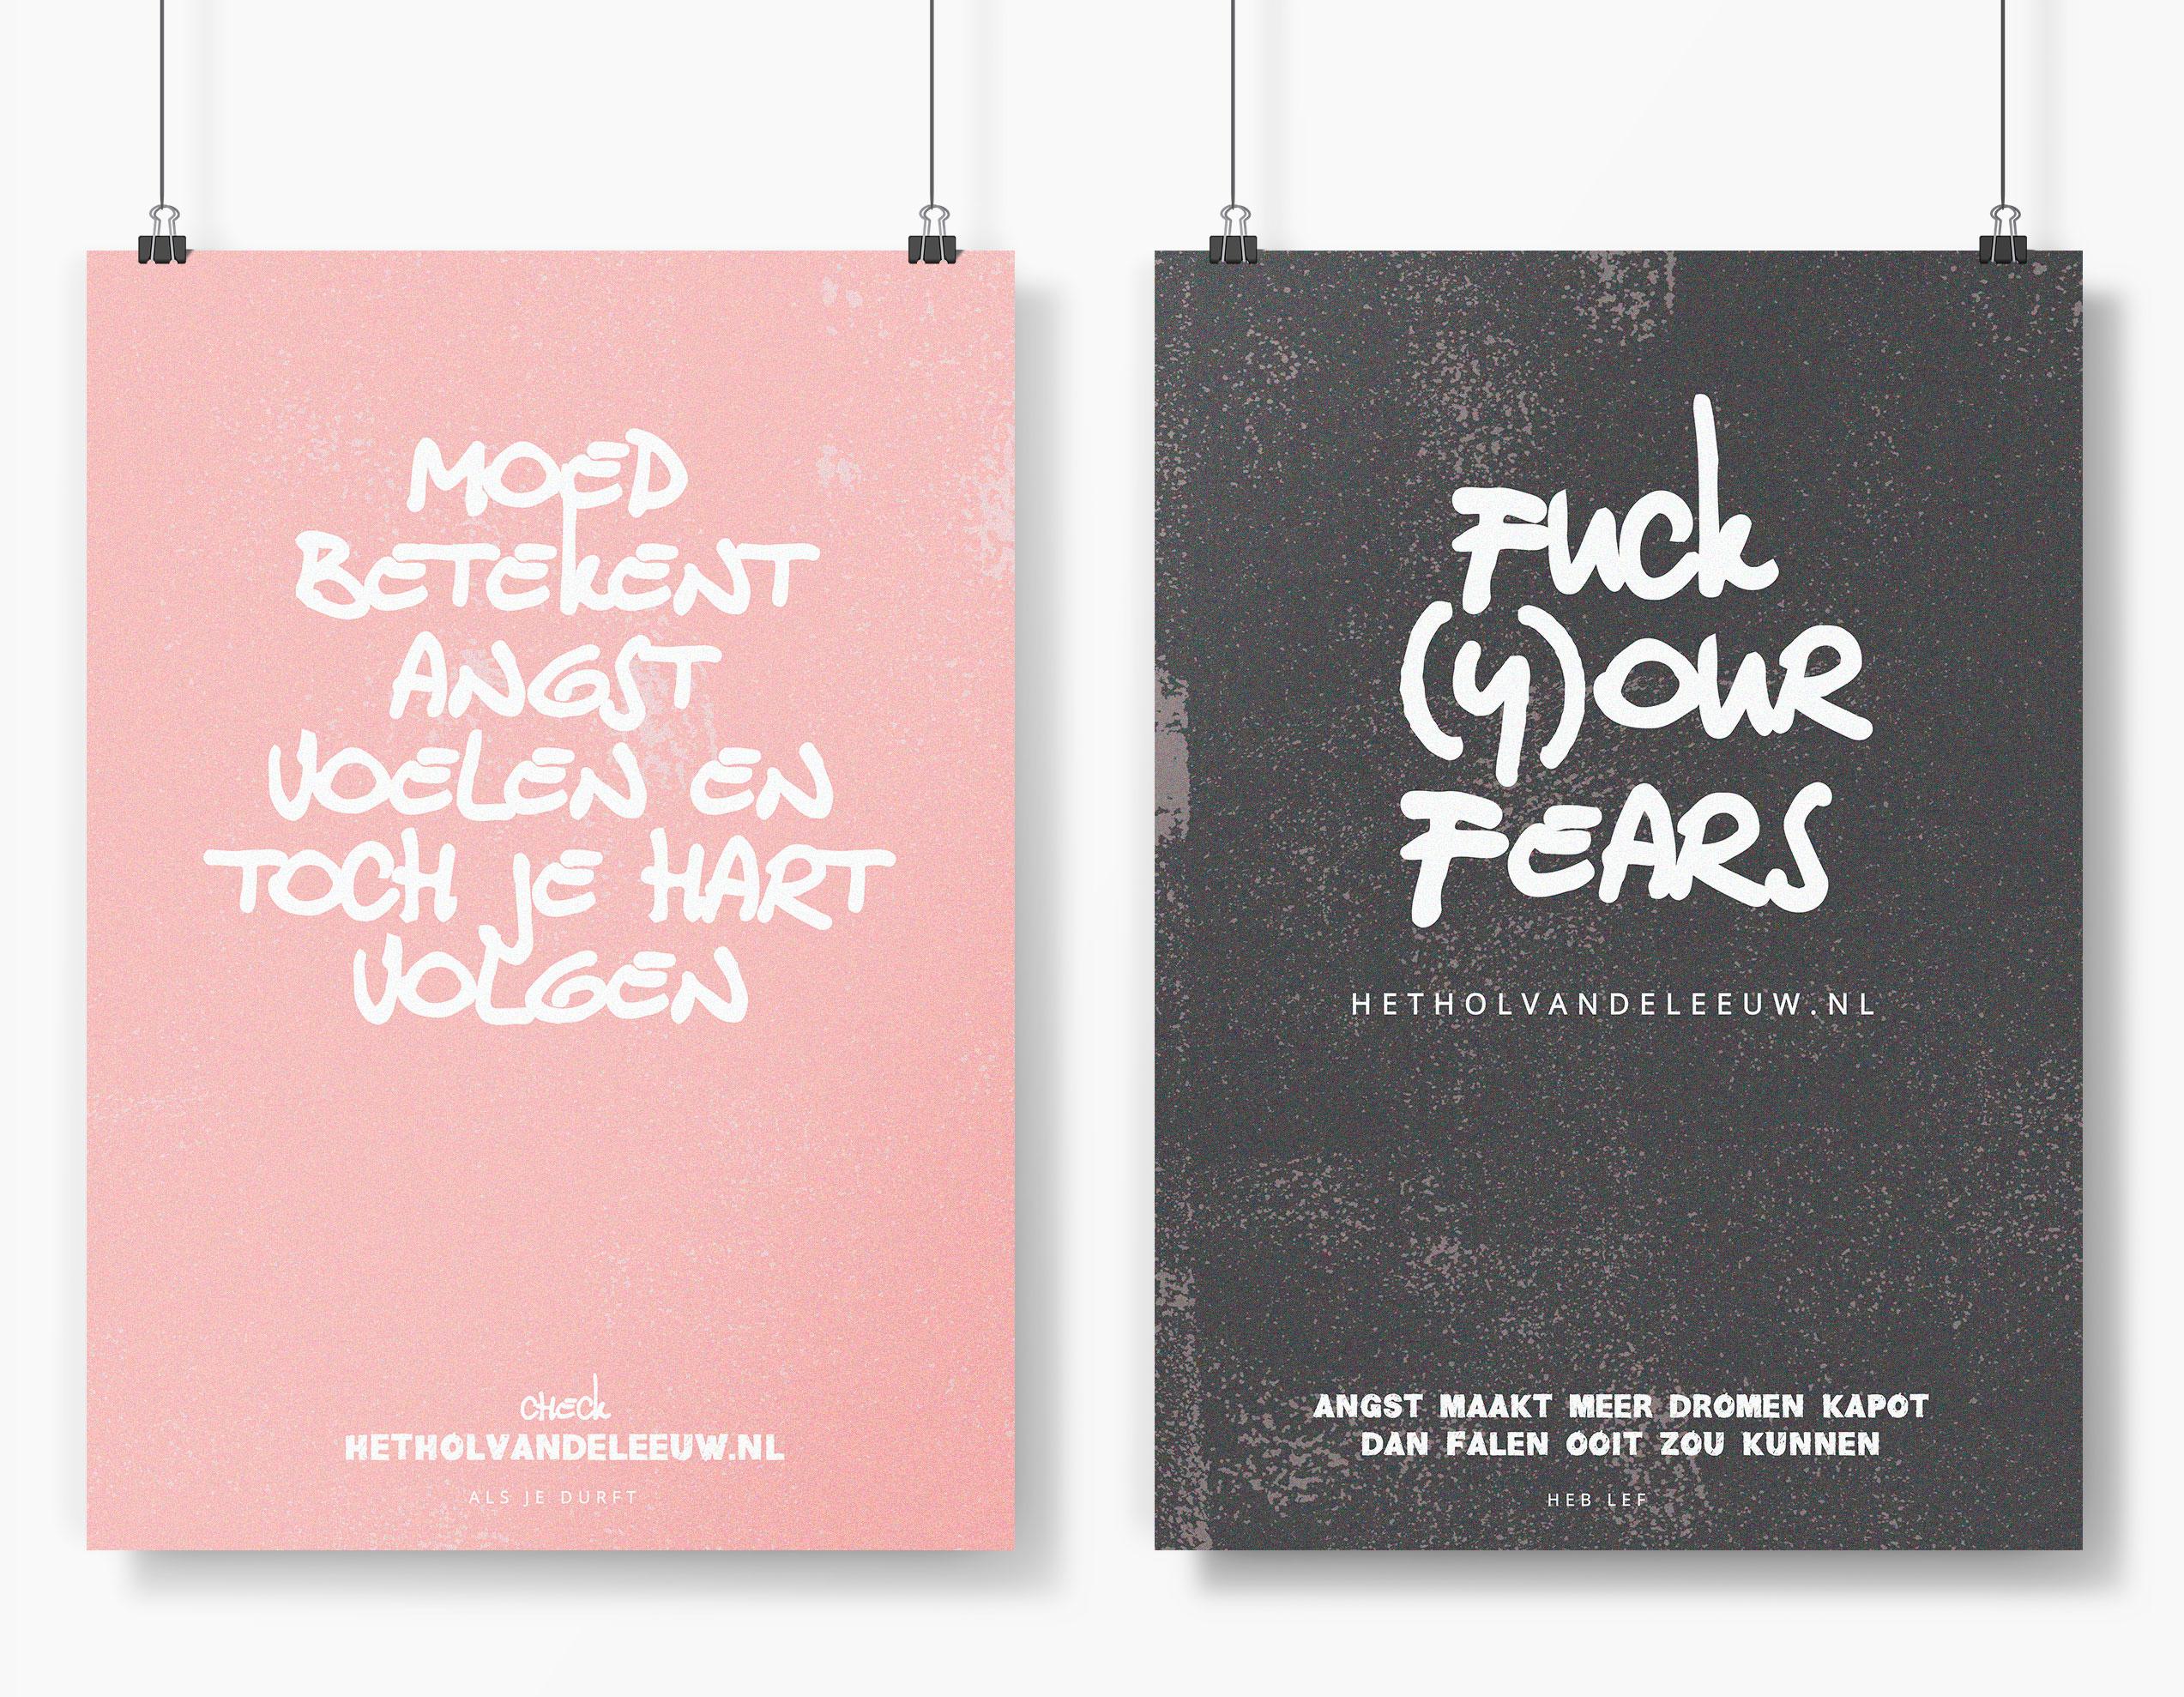 poster-serie-voor2naastelkaar-1